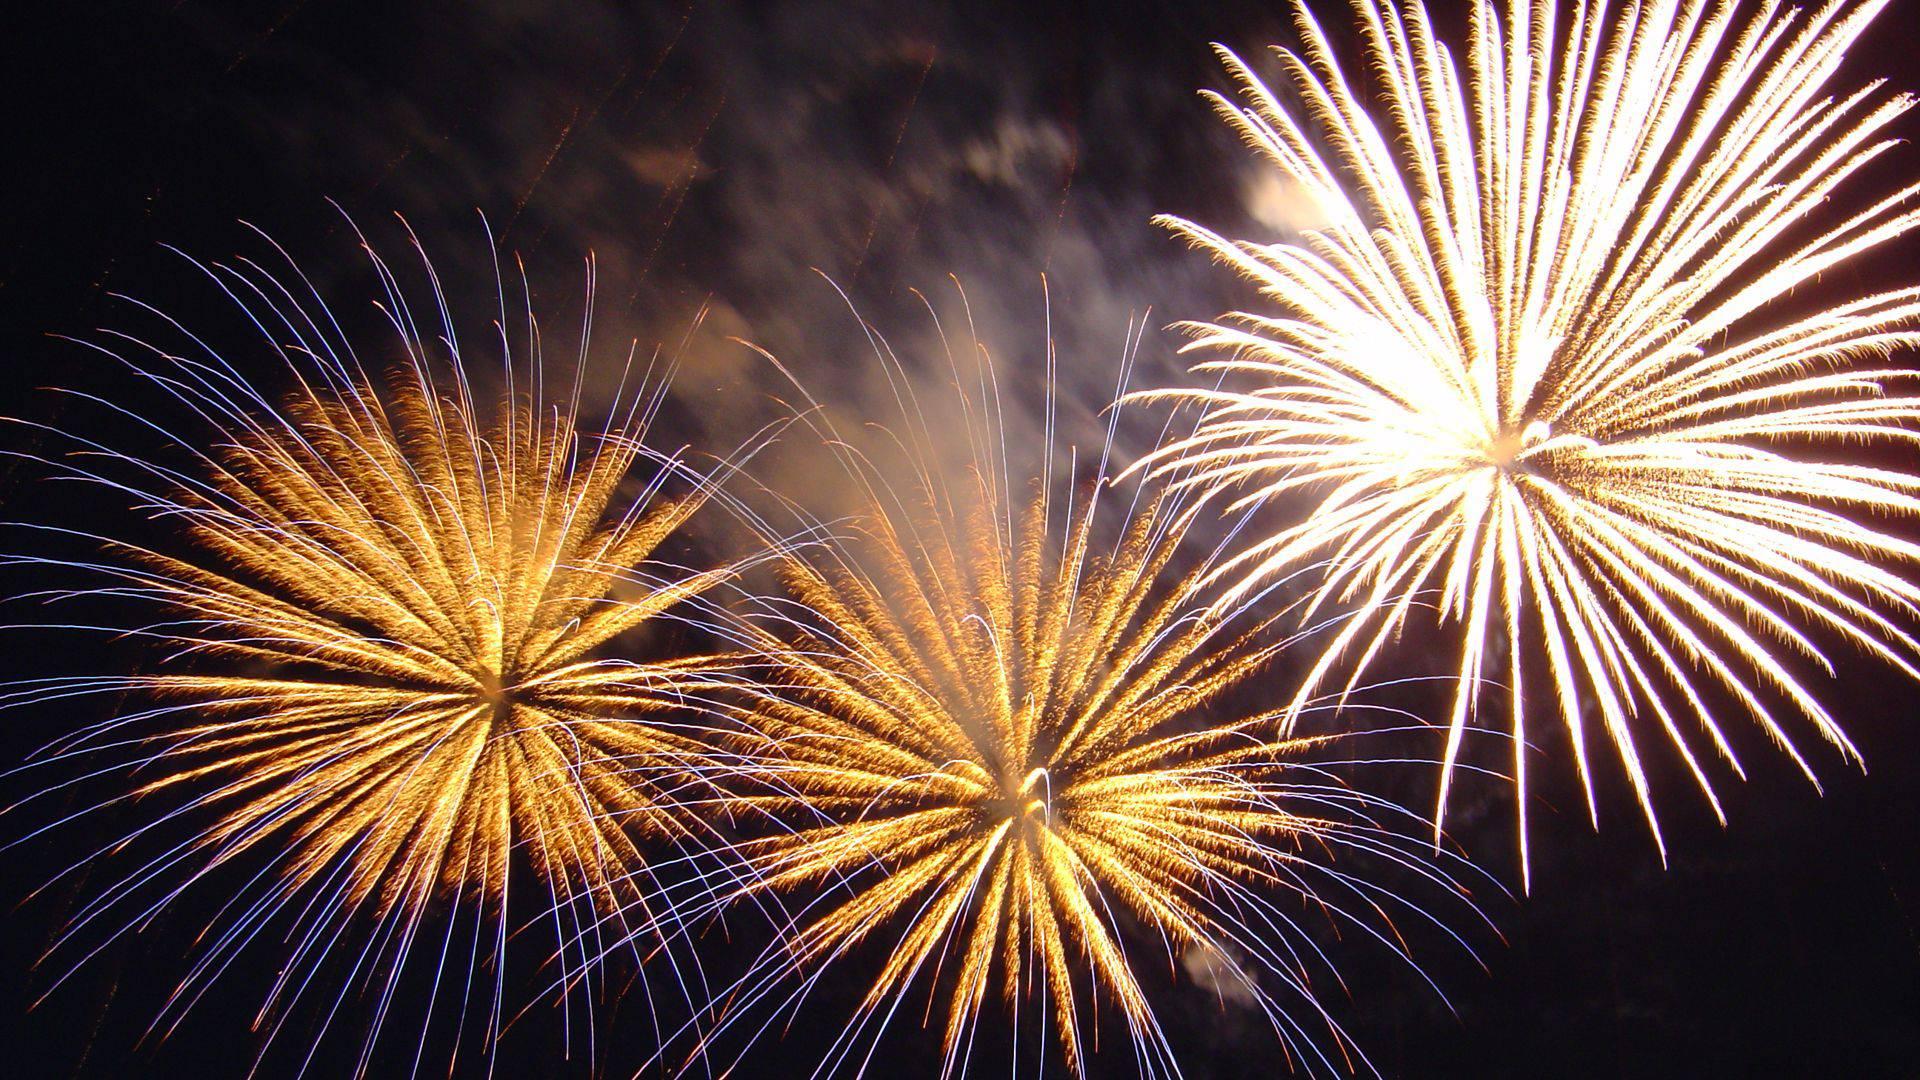 Fireworks Wallpaper · Fireworks Wallpaper ...